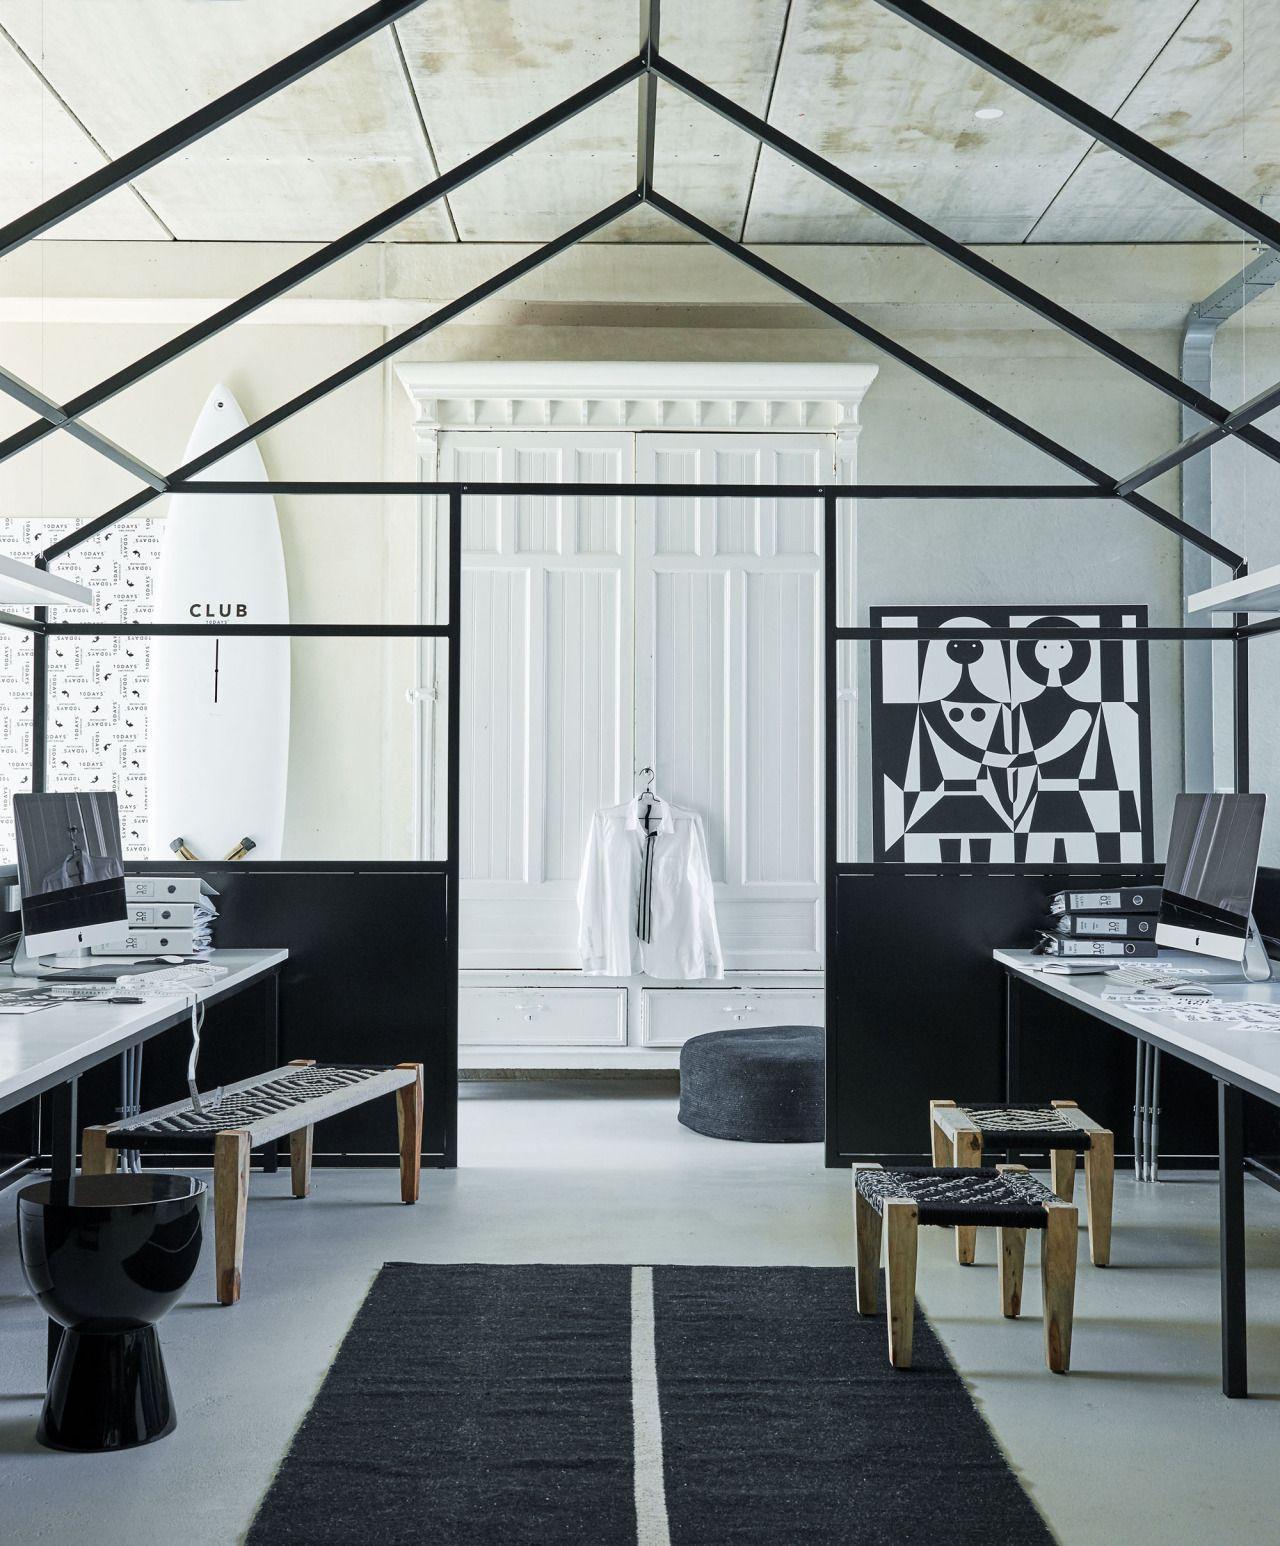 Black and white workspace industrial home design house interiors style also interiordesign pinterest interior rh